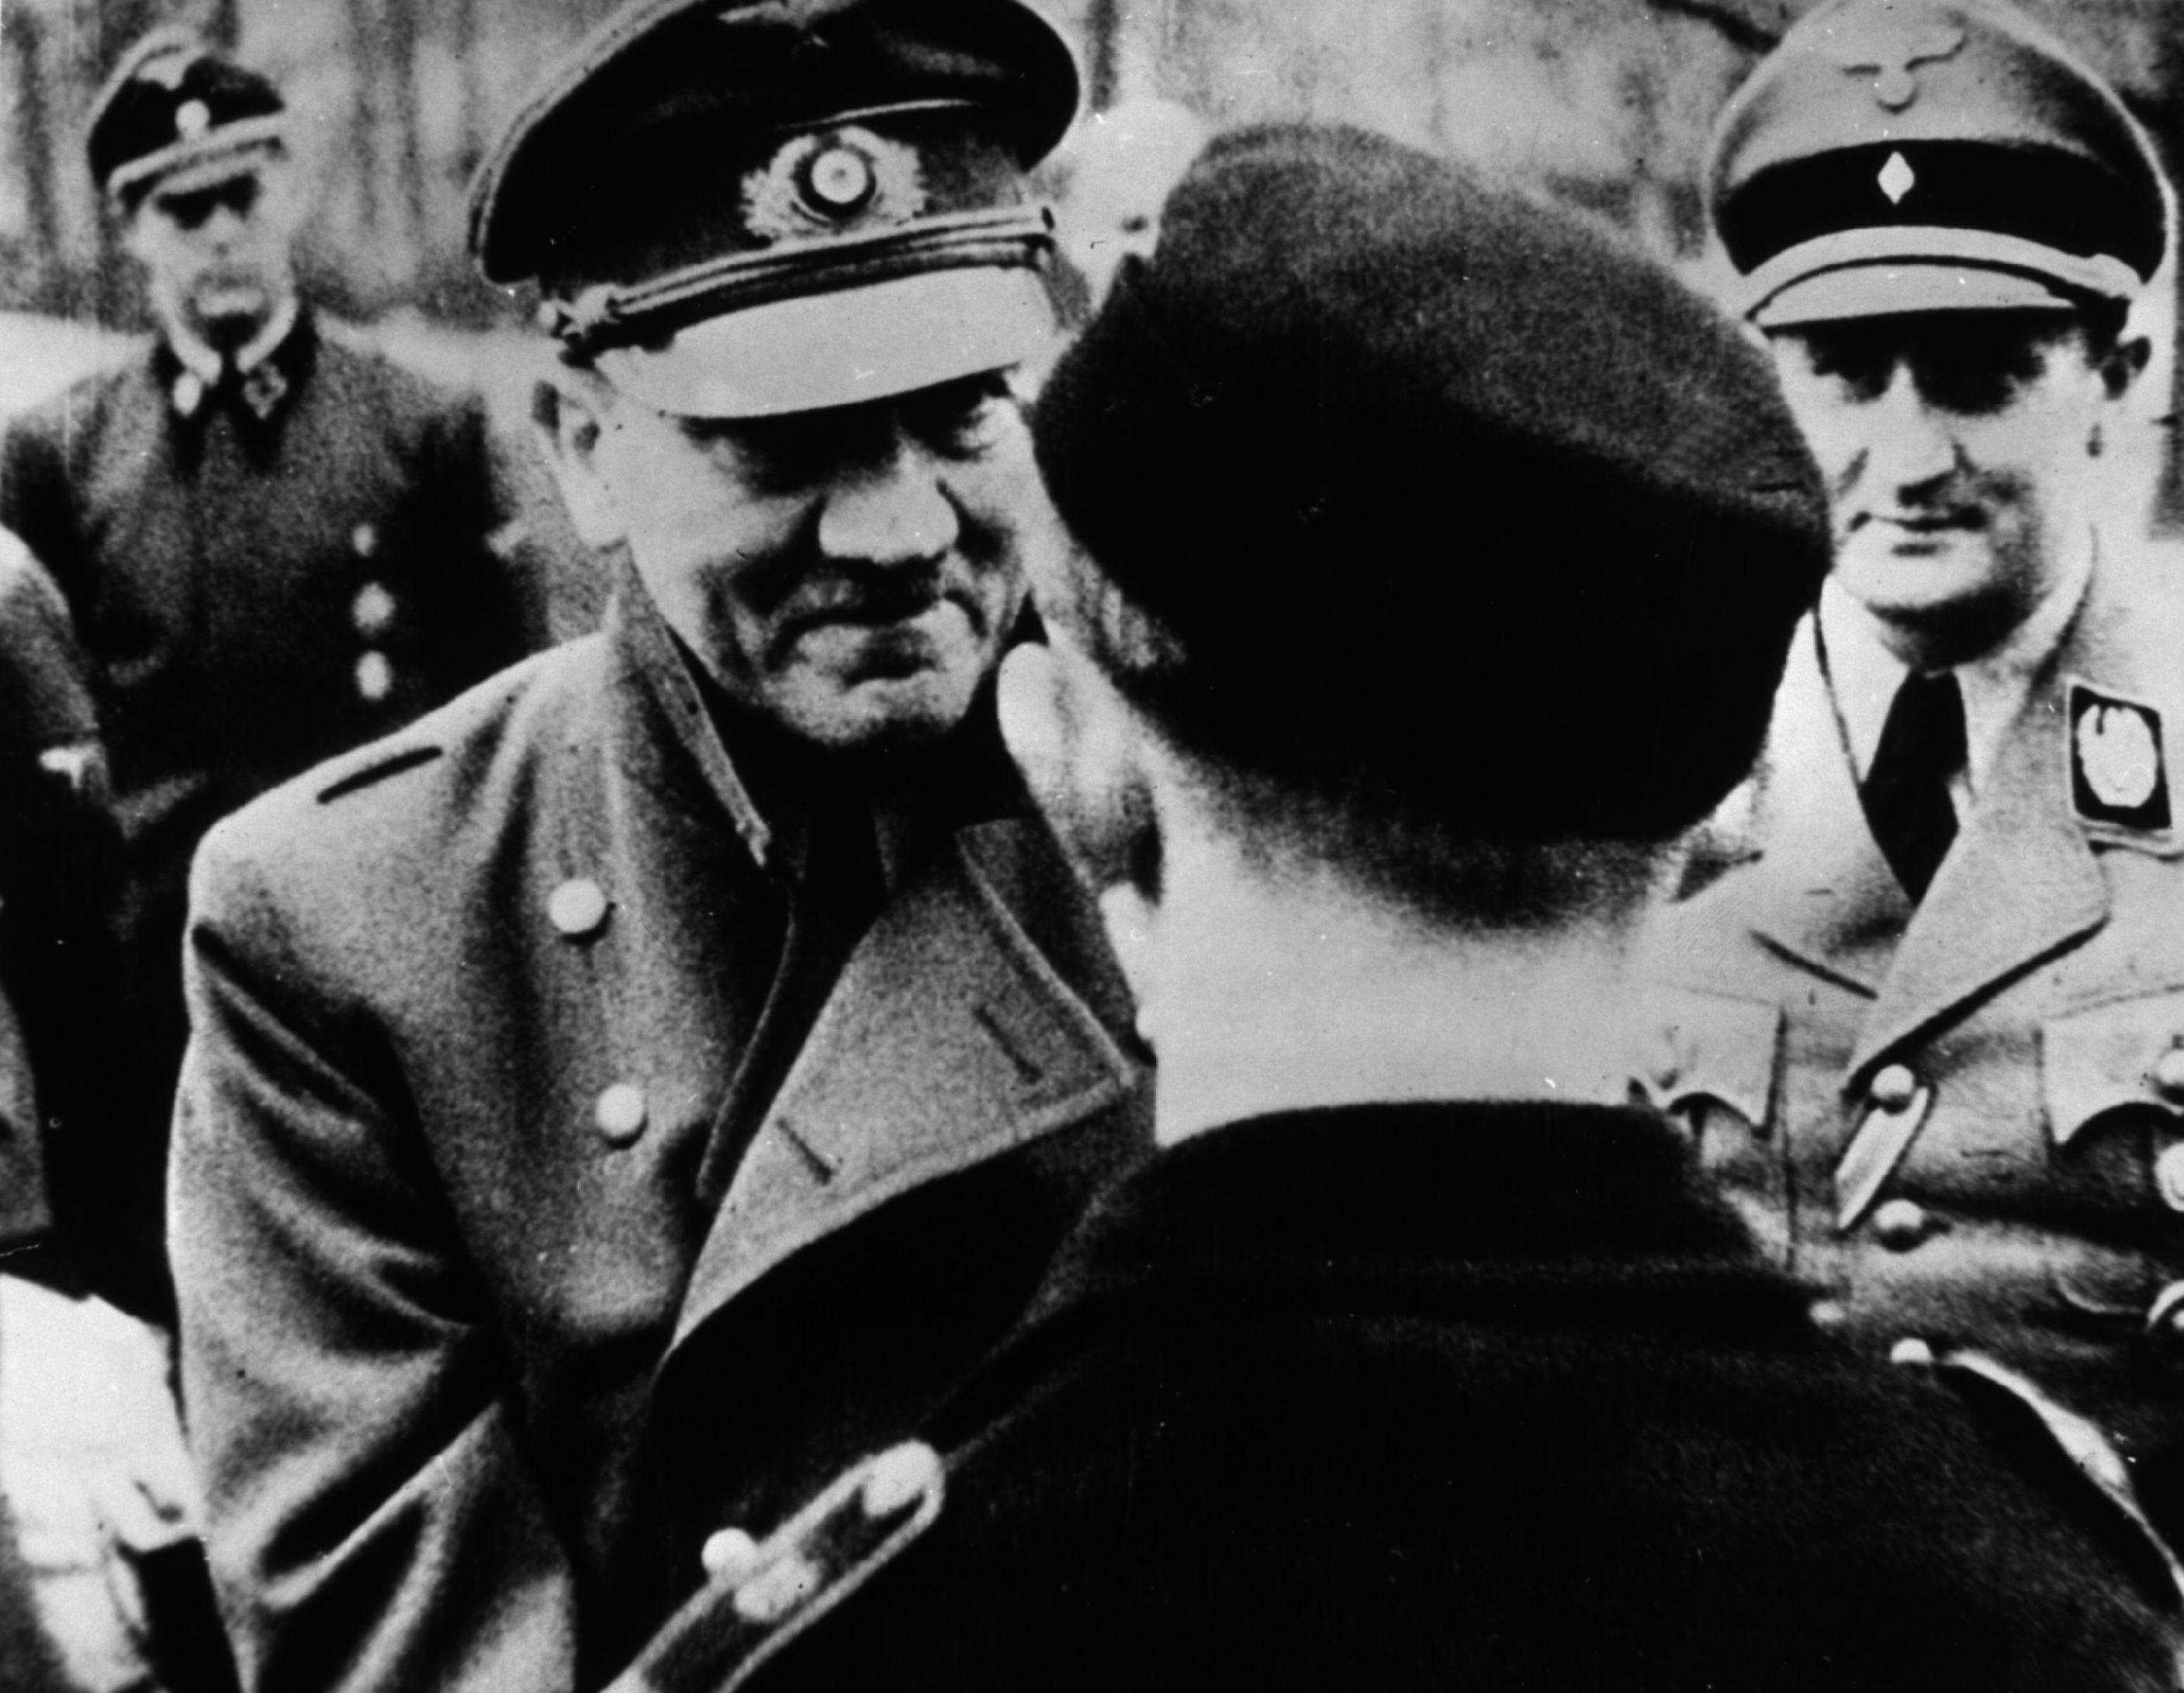 Last Hitler Photo